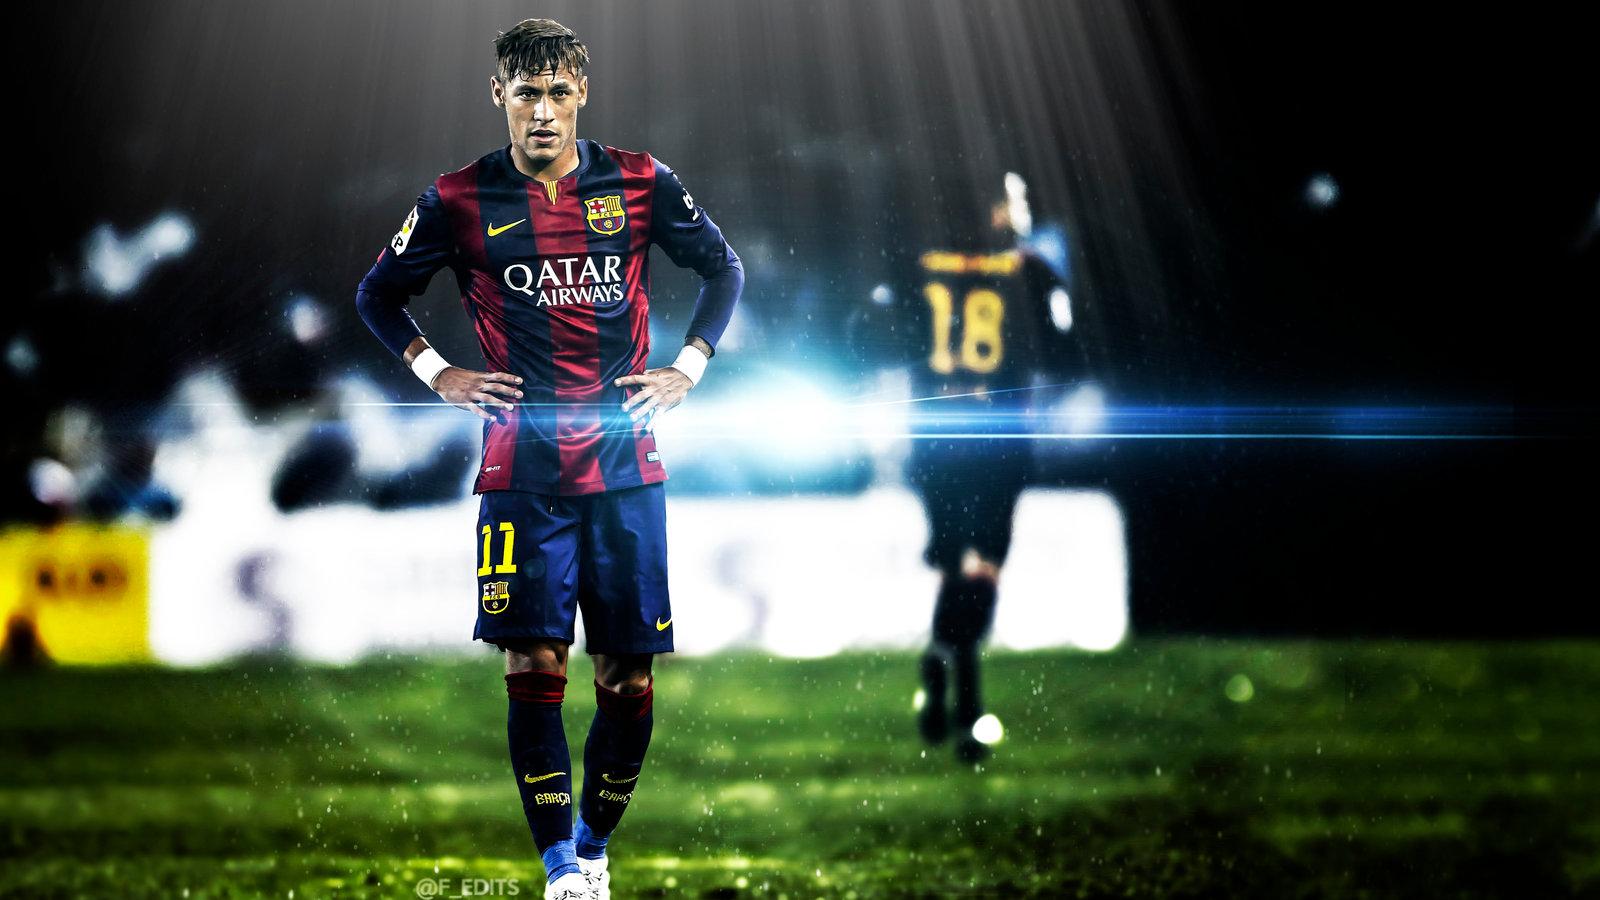 Hd wallpaper neymar - Barcelona S Neymar Jr Hd Wallpaper By F Edits By F Edits On